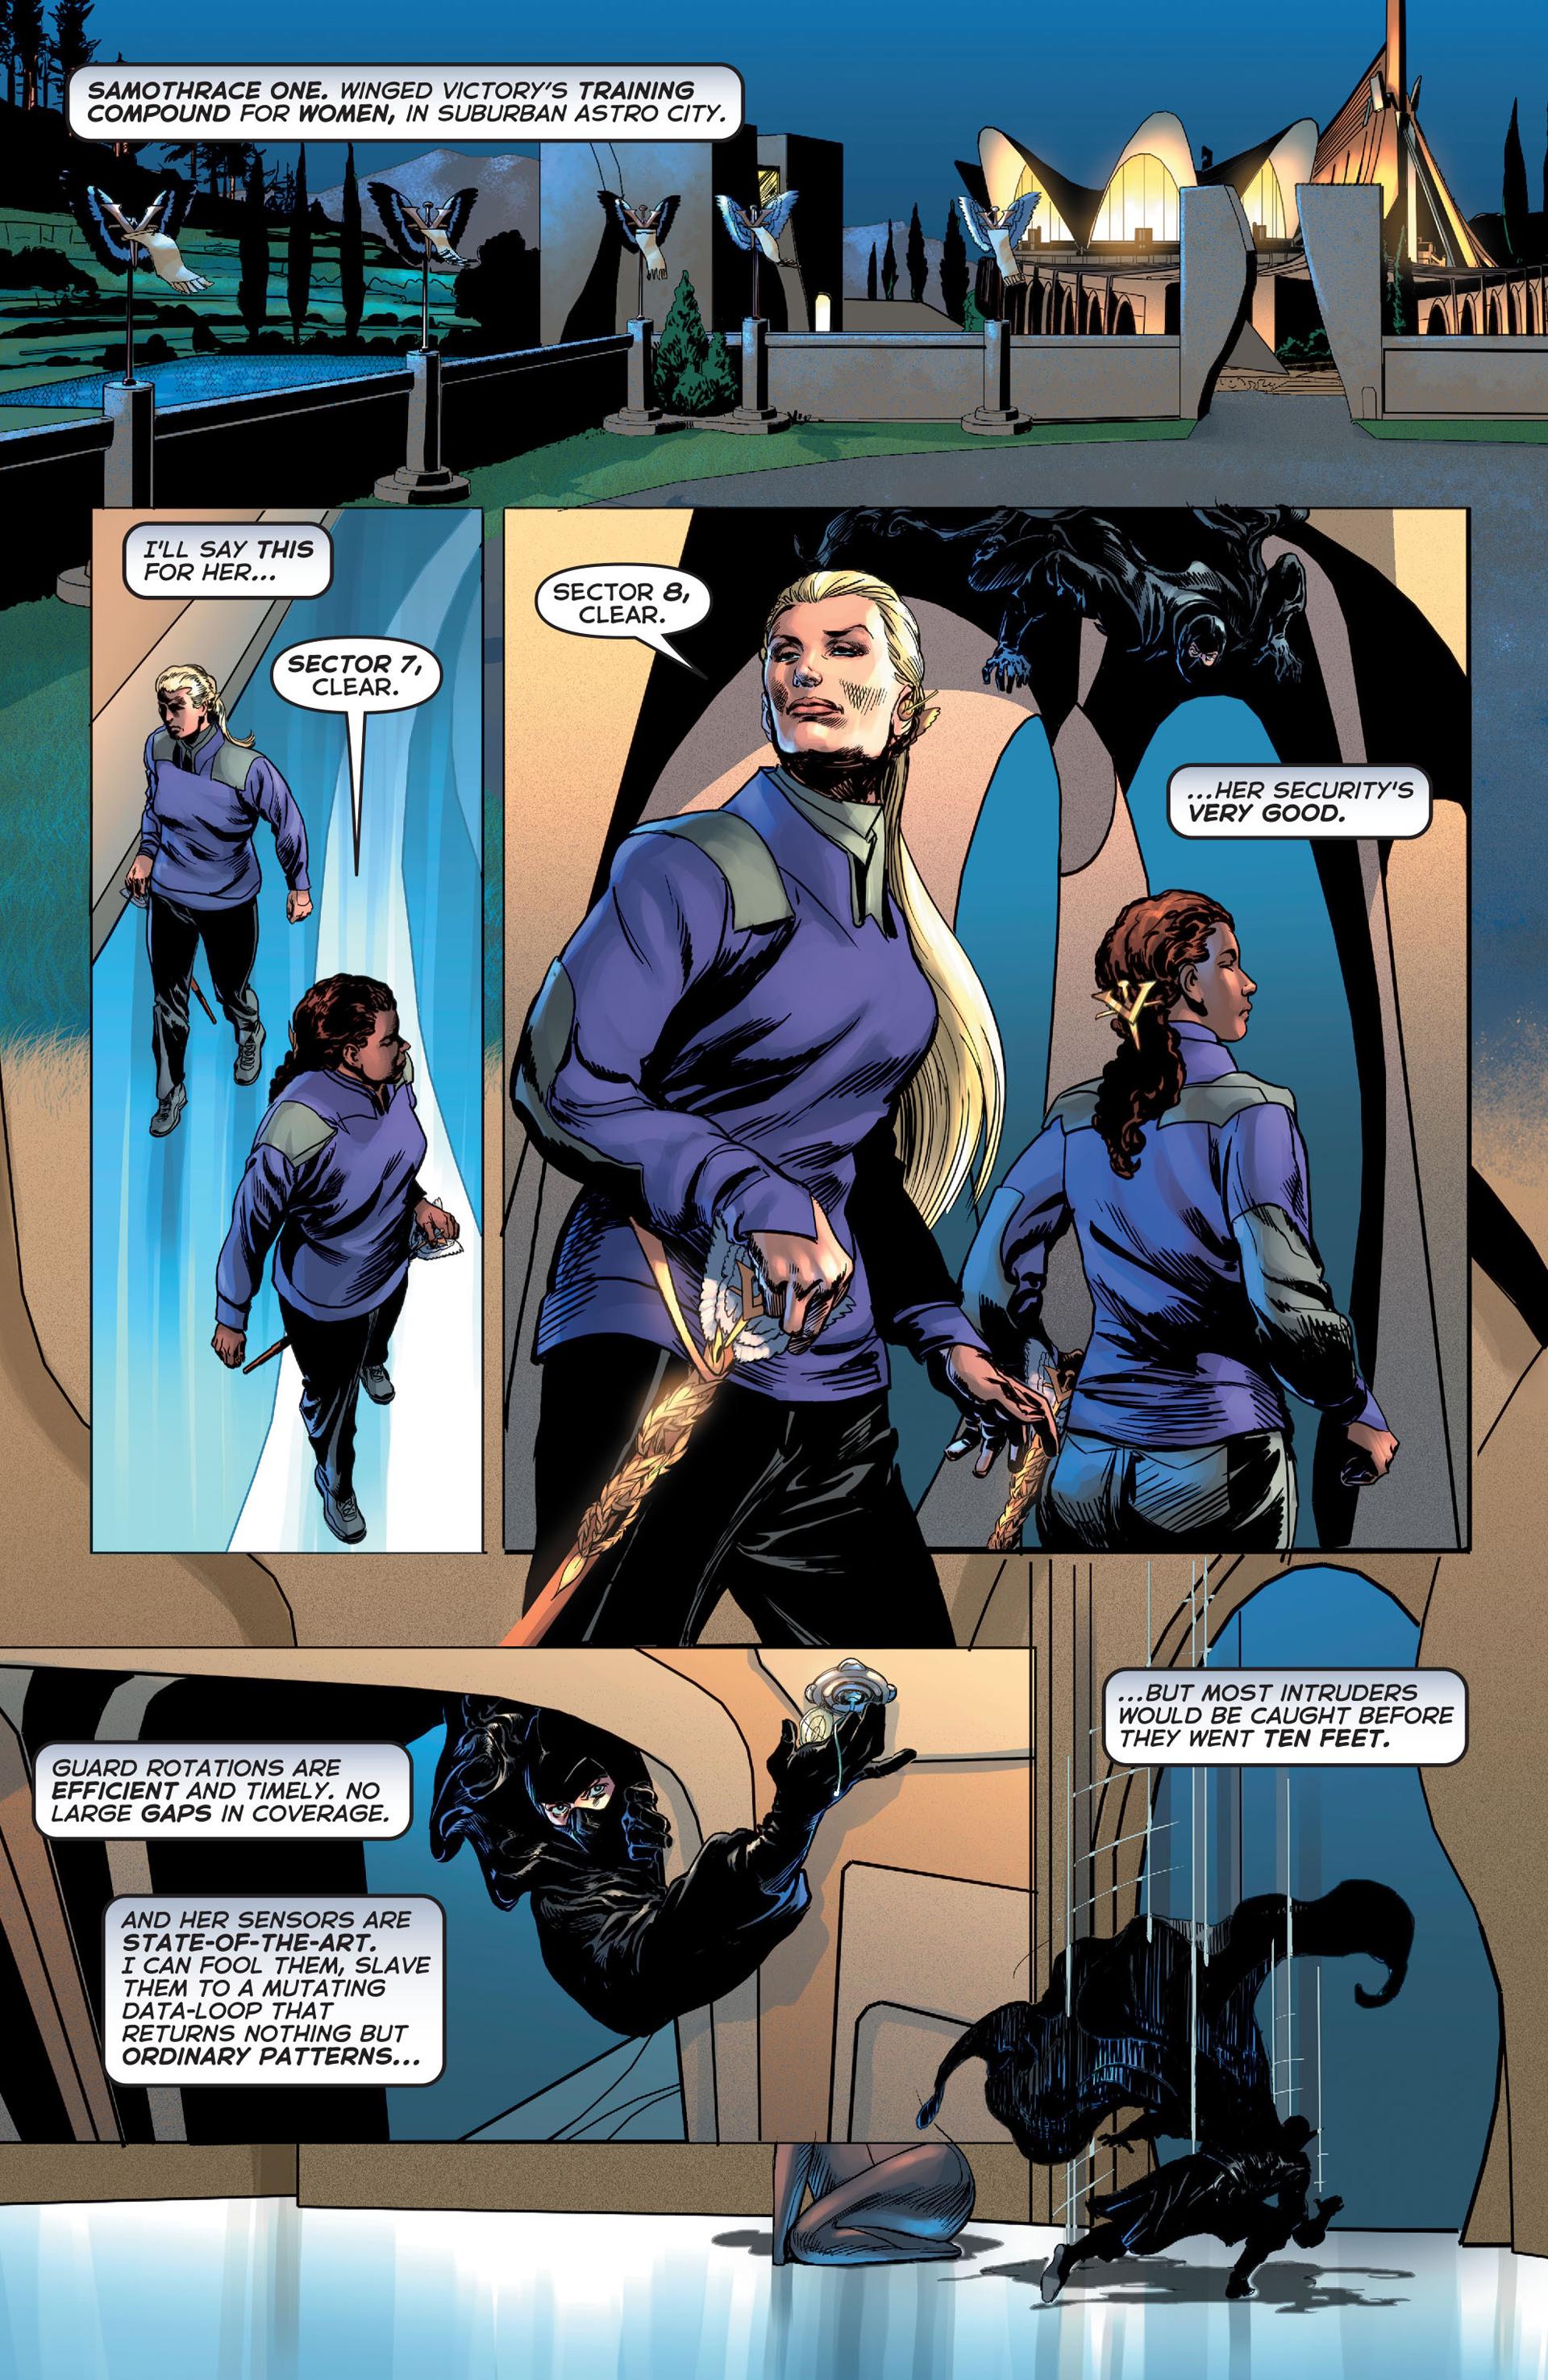 Read online Astro City comic -  Issue #8 - 2